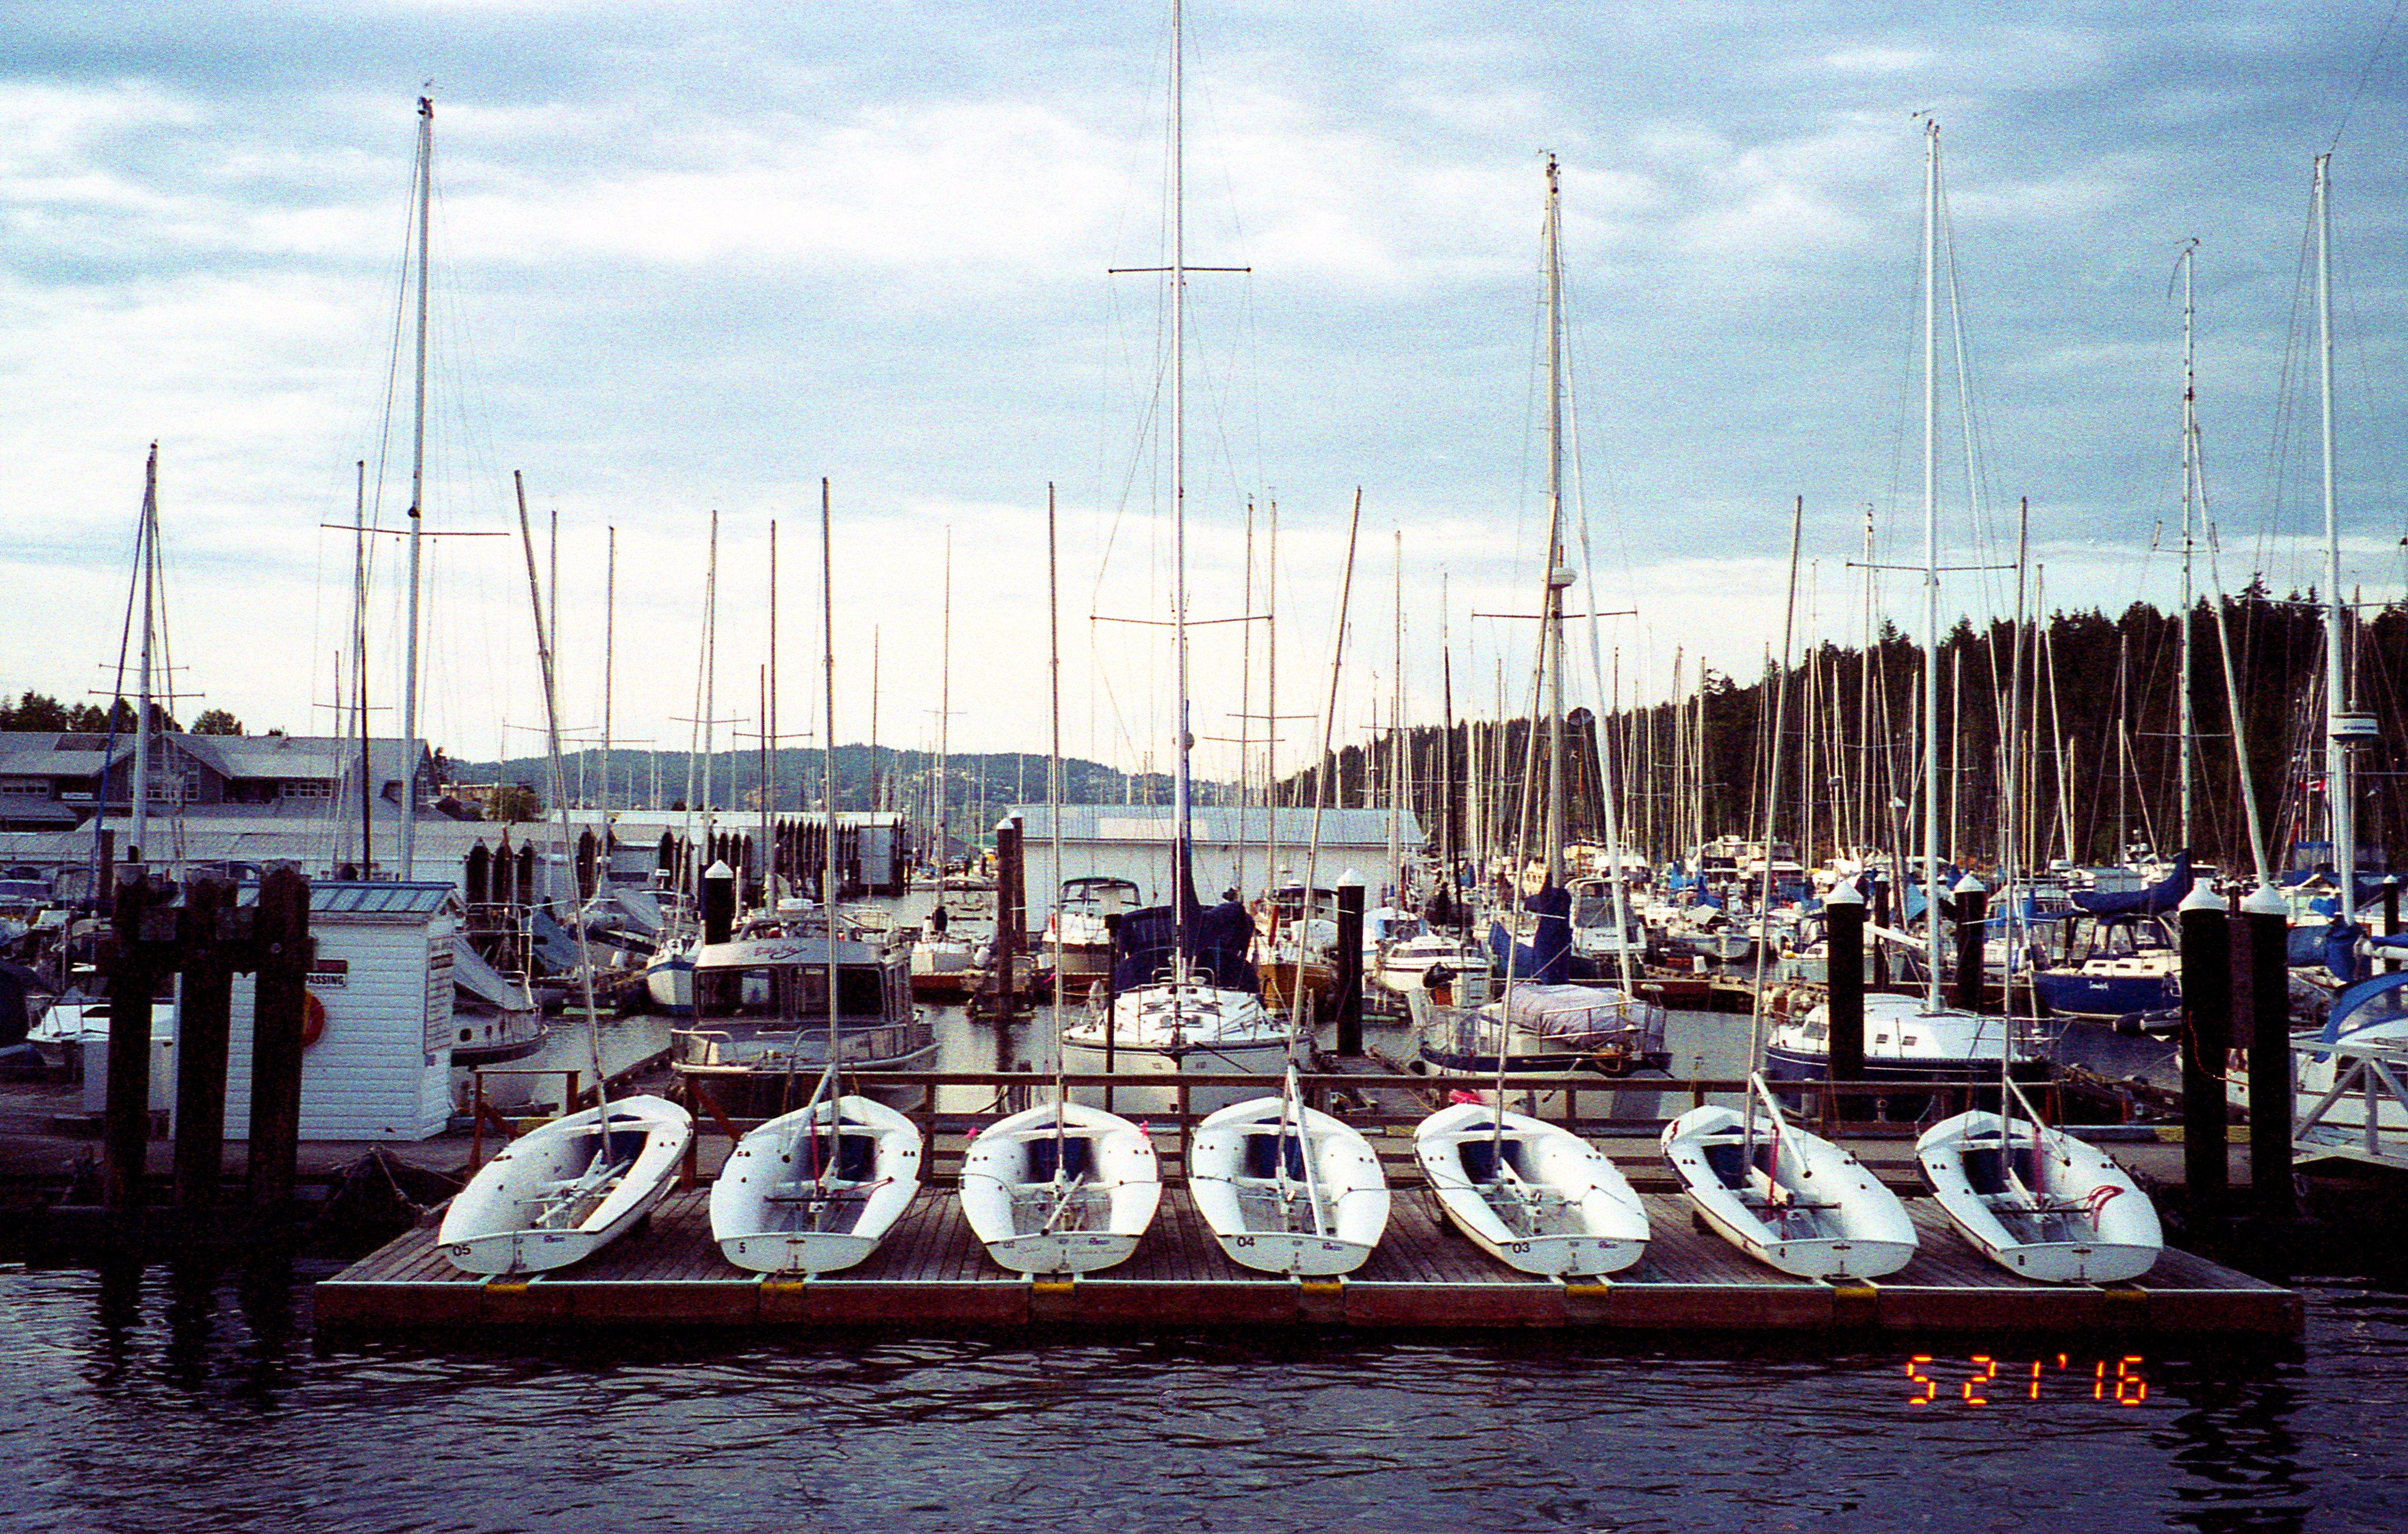 Nanaimo Yacht Club Youth Sailing Program - Konica Z-up 80 Super Zoom (1988) with 9-year expired Kodak ISO 200 Film (Expired 2007)